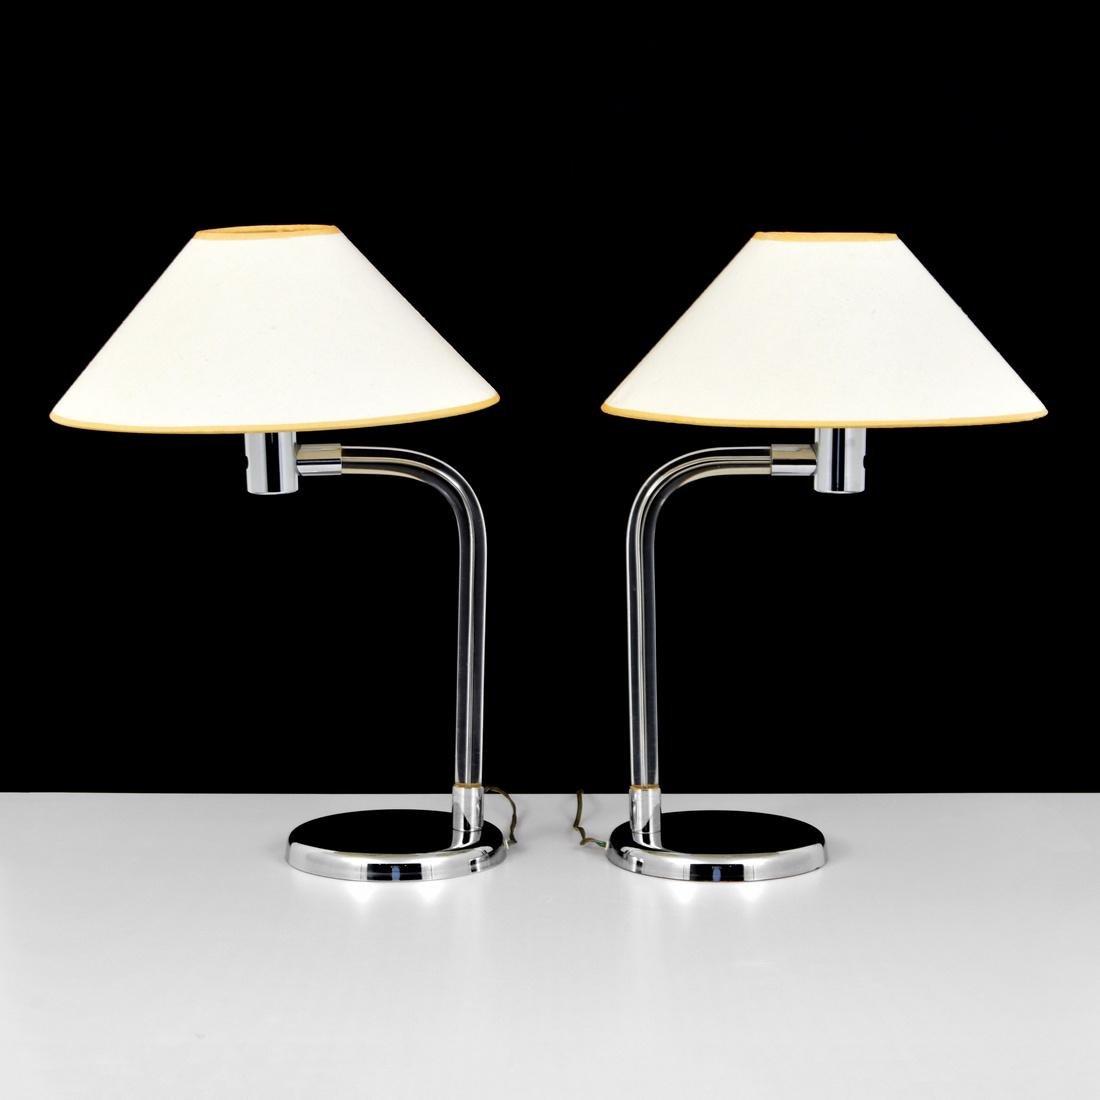 Pair of Peter Hamburger Lamps - 2